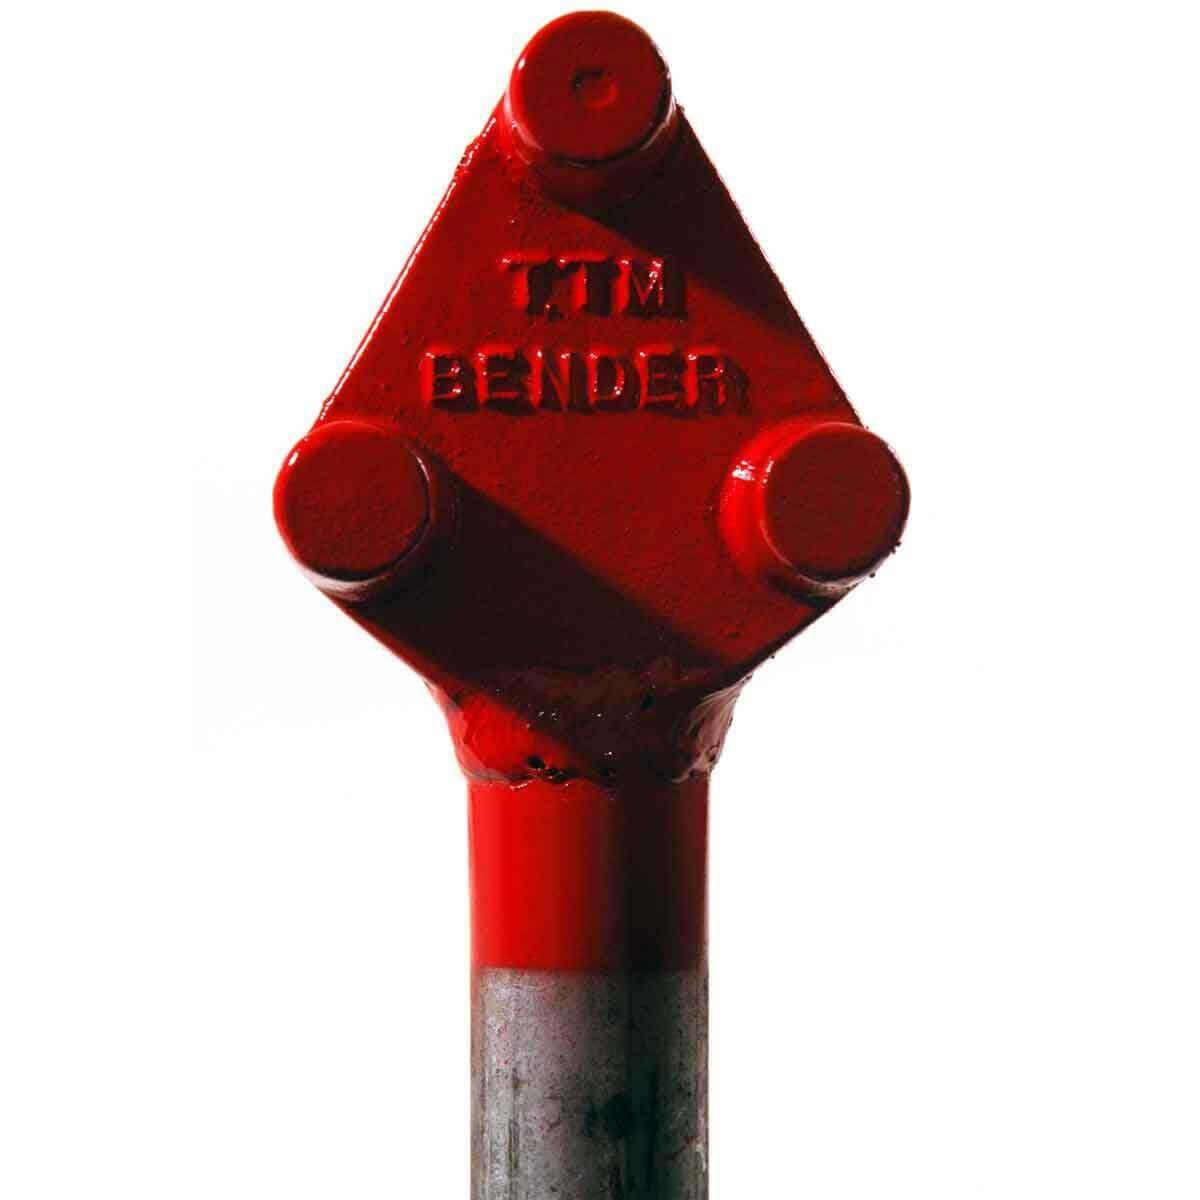 Lhickey Tolman Rebar (Hickey) Bender